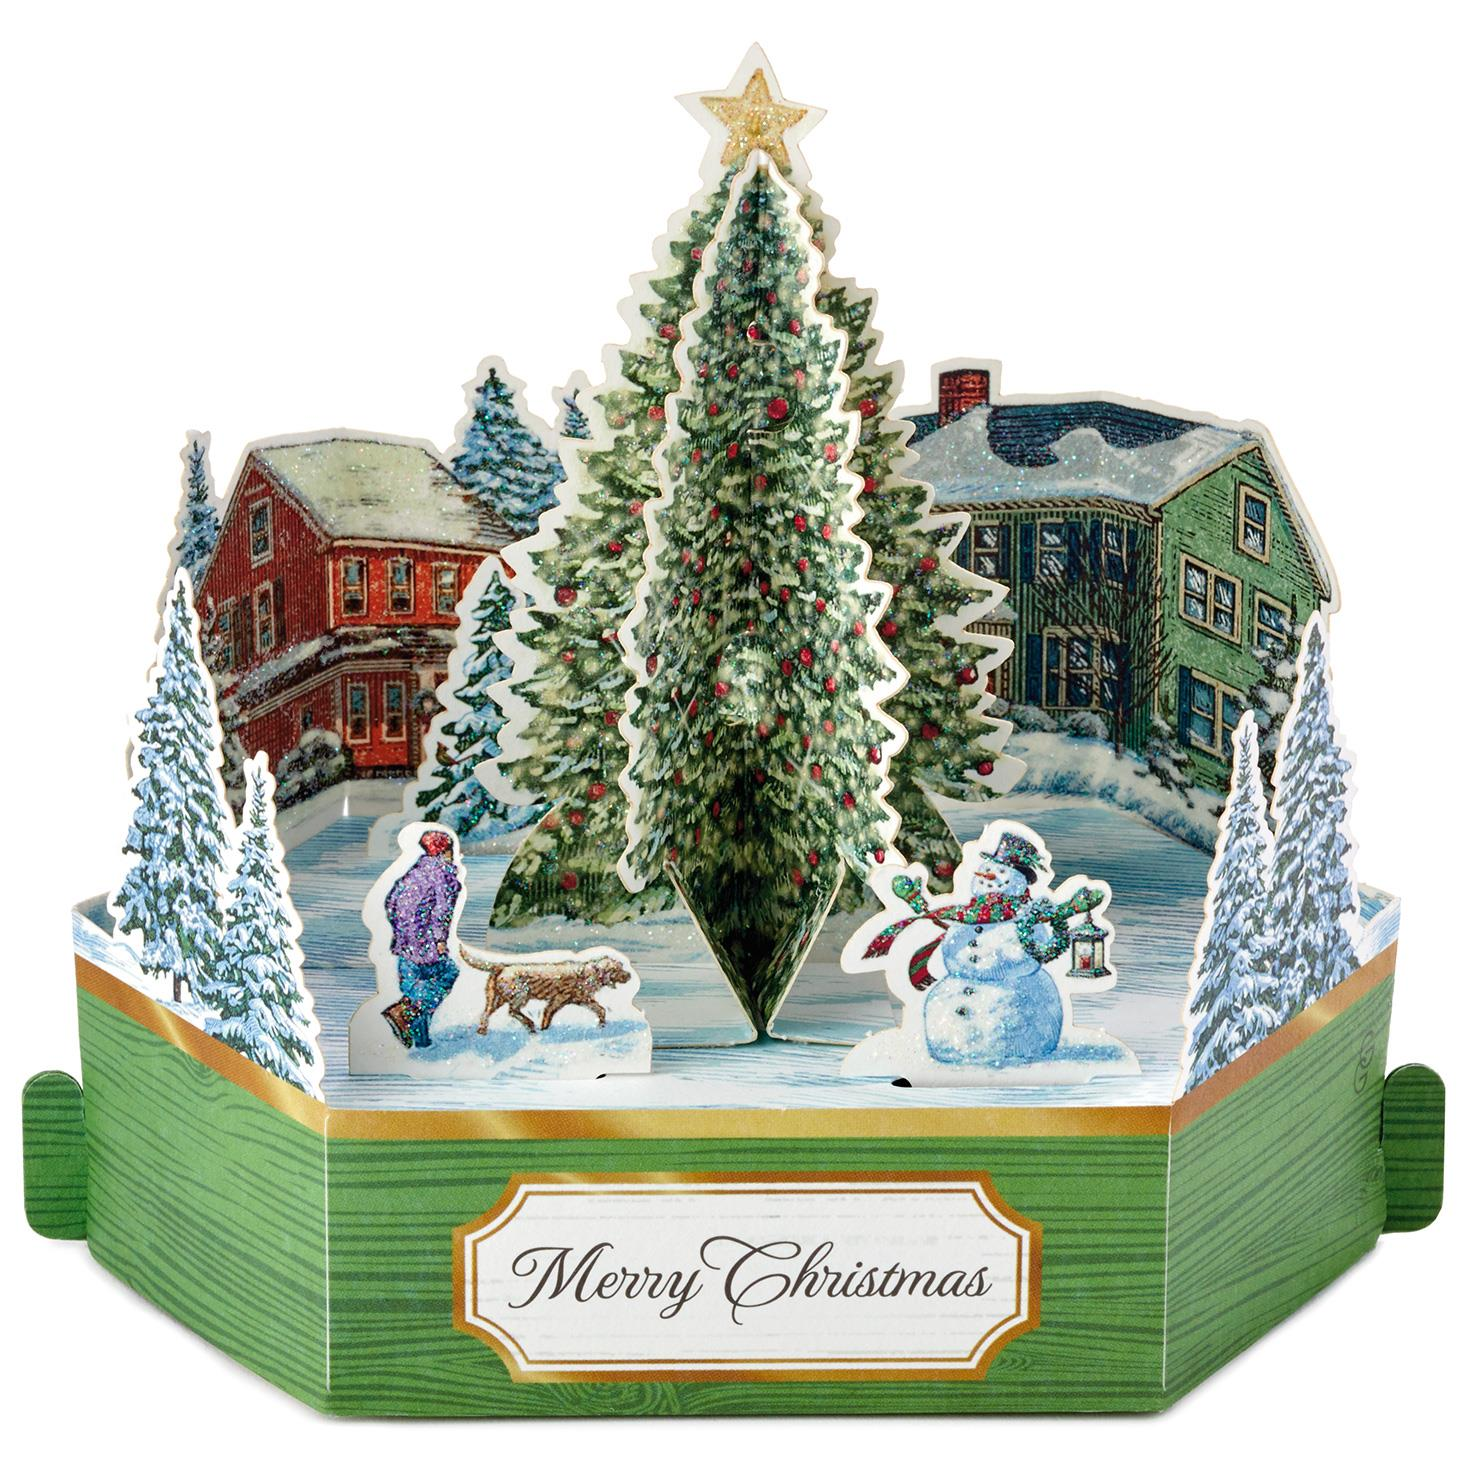 merry christmas tree mini pop up christmas card - Merry Christmas Card